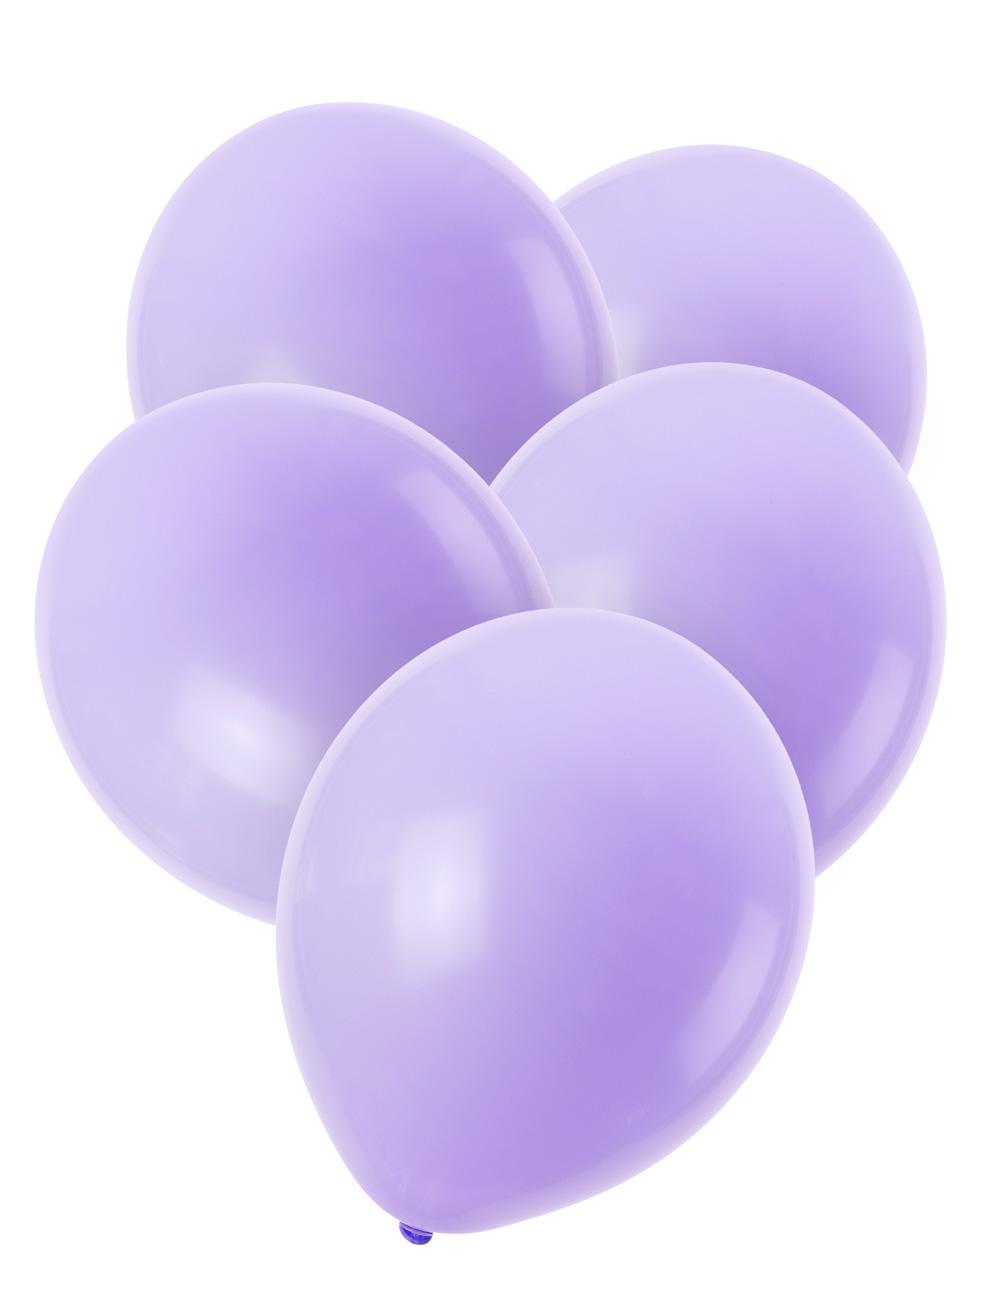 Luftballons lila 50 Stk.